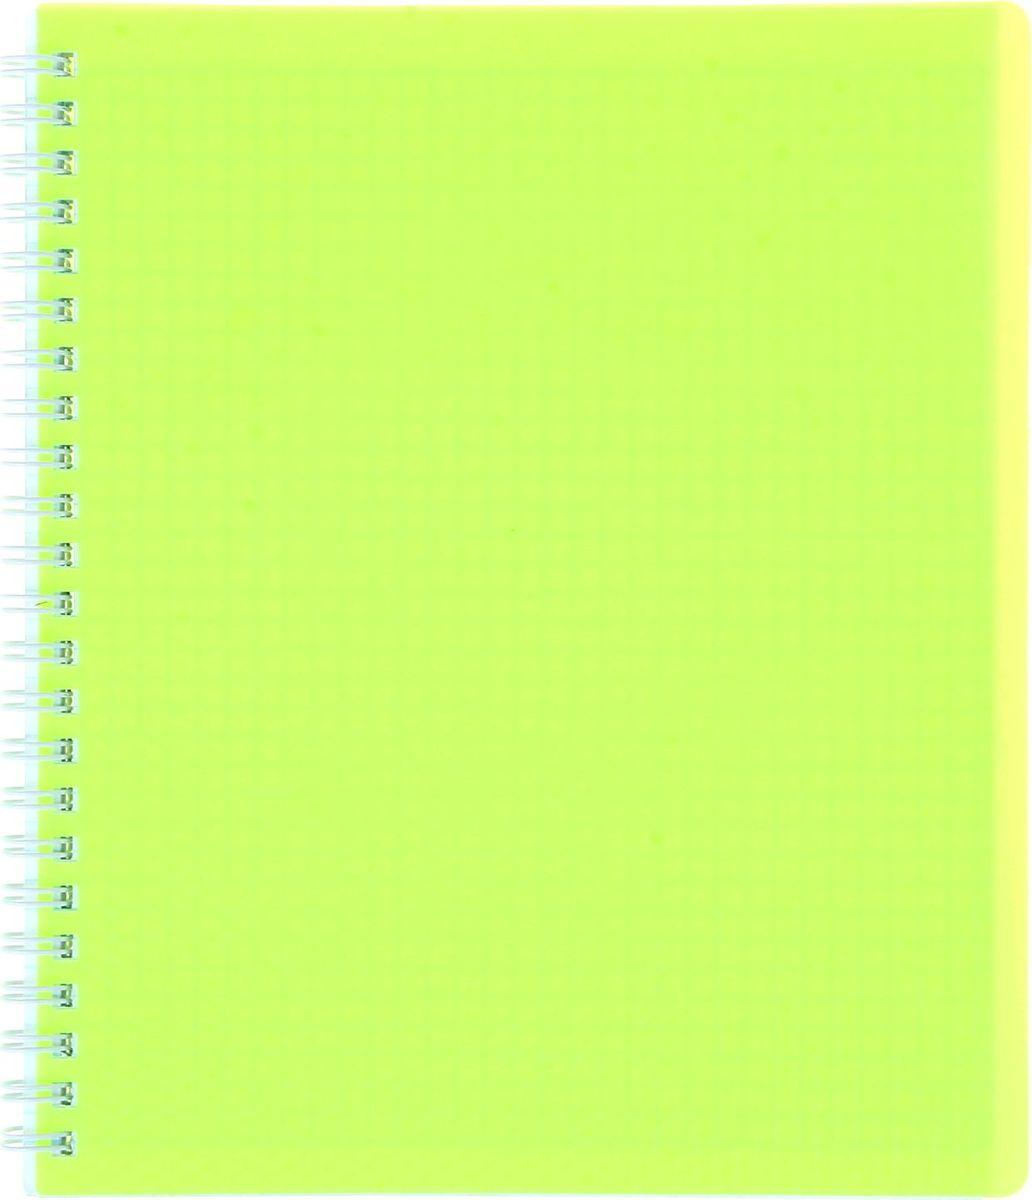 Hatber Тетрадь Diamond Neon 80 листов в клетку цвет желтый1020842